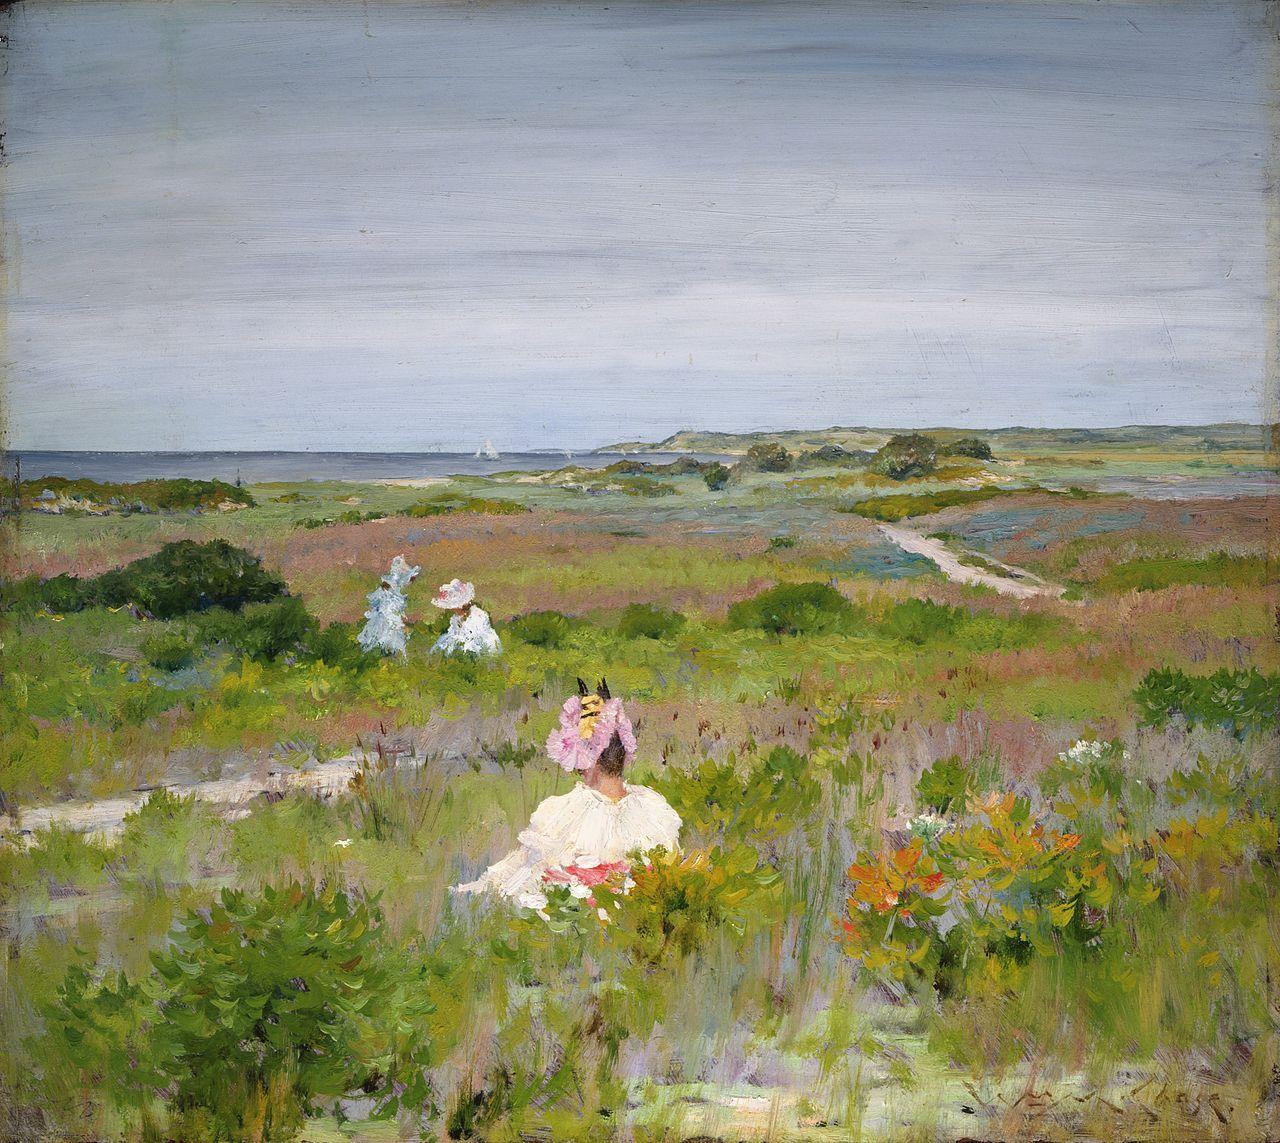 William Merritt Chase - Shinnecock, Long Island (c.1896) - William Merritt Chase - Wikipedia, the free encyclopedia